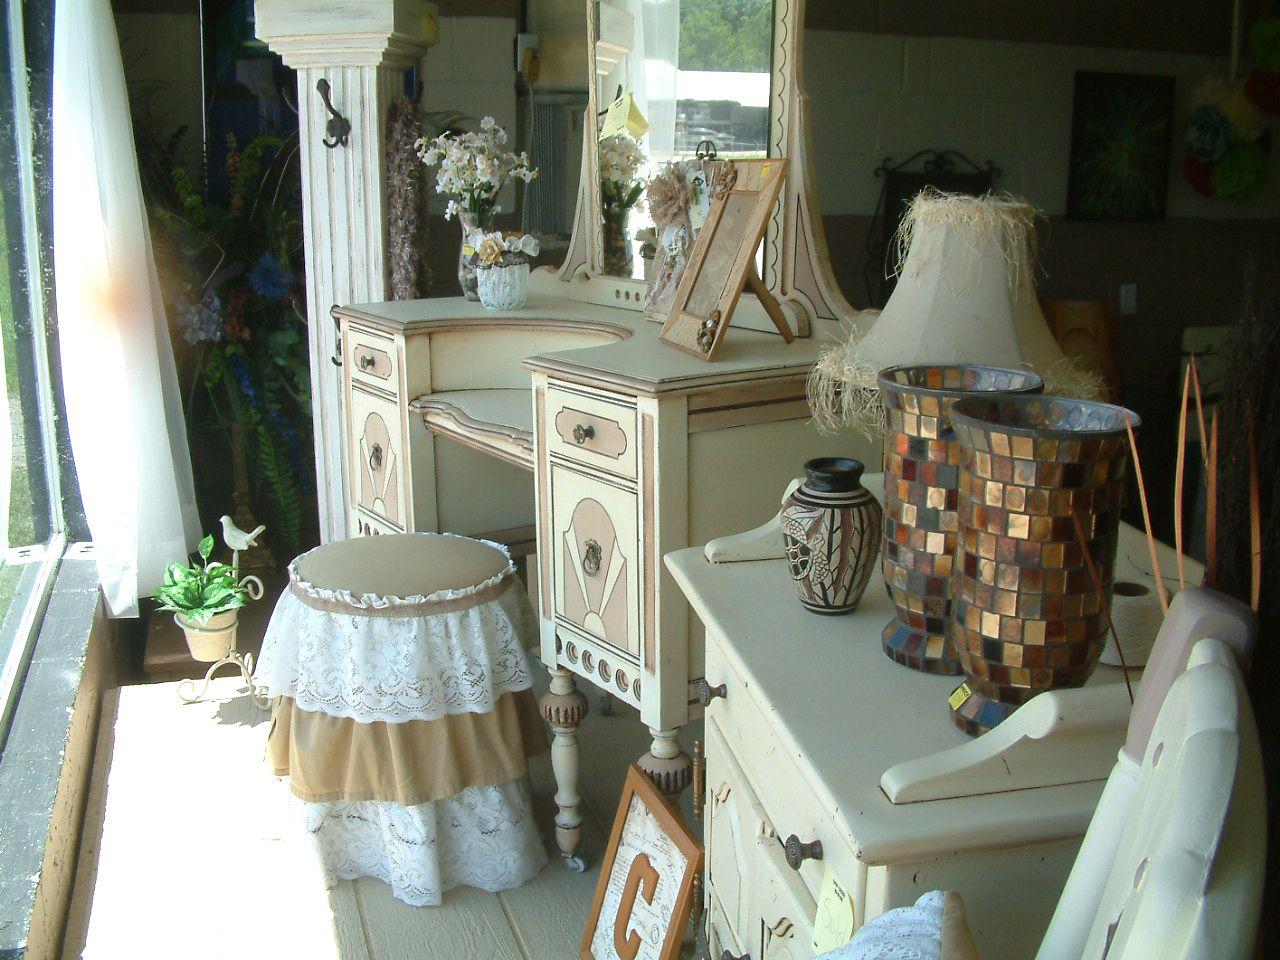 repurposed furniture store. Store Display Of Repurposed Furniture And Accents At Just Repurposed. A